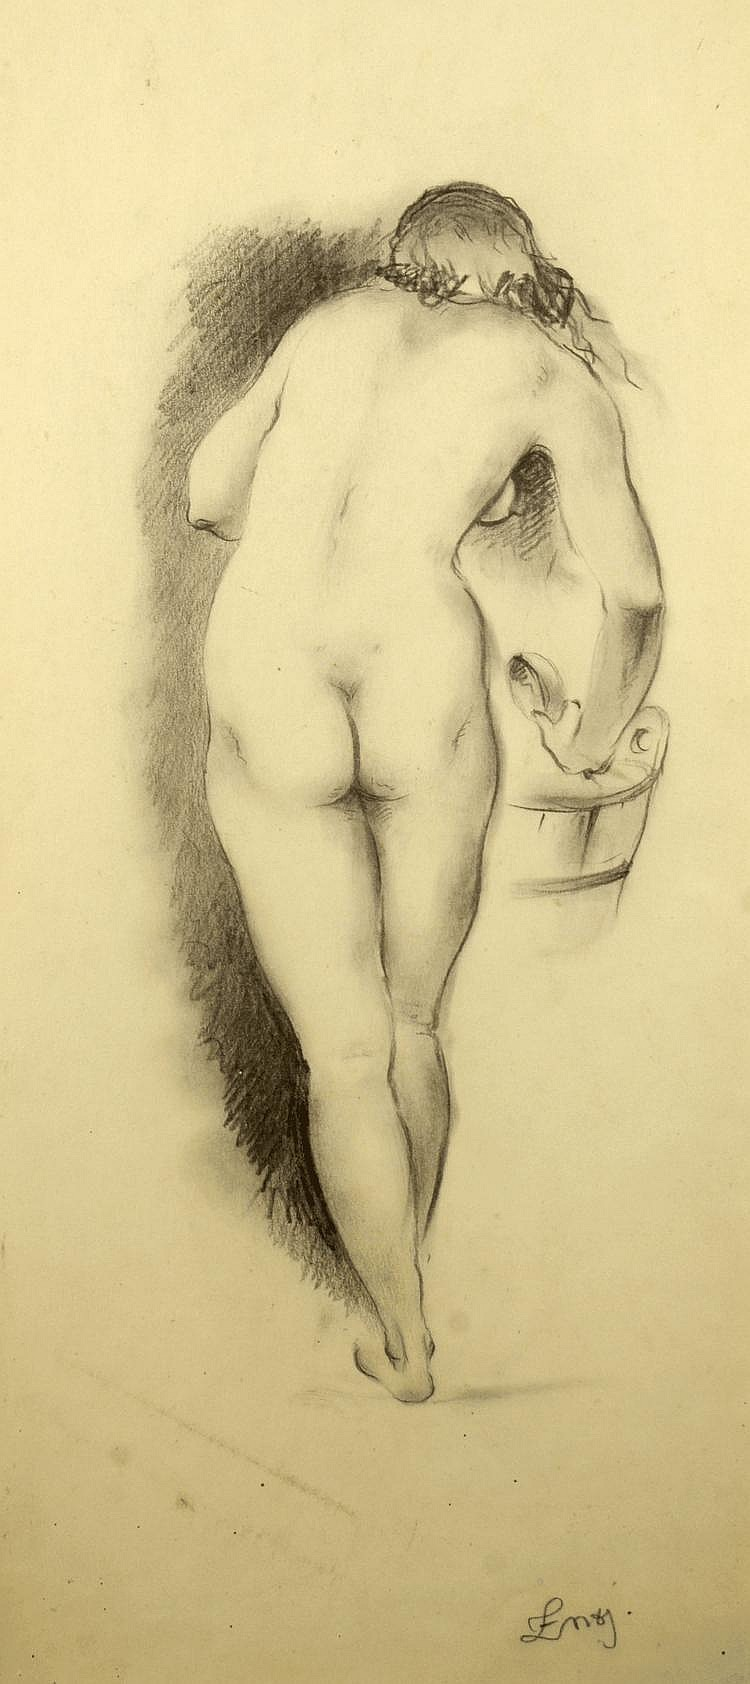 Eduard S. Kostrhon (1910-1966), Jan Znoj